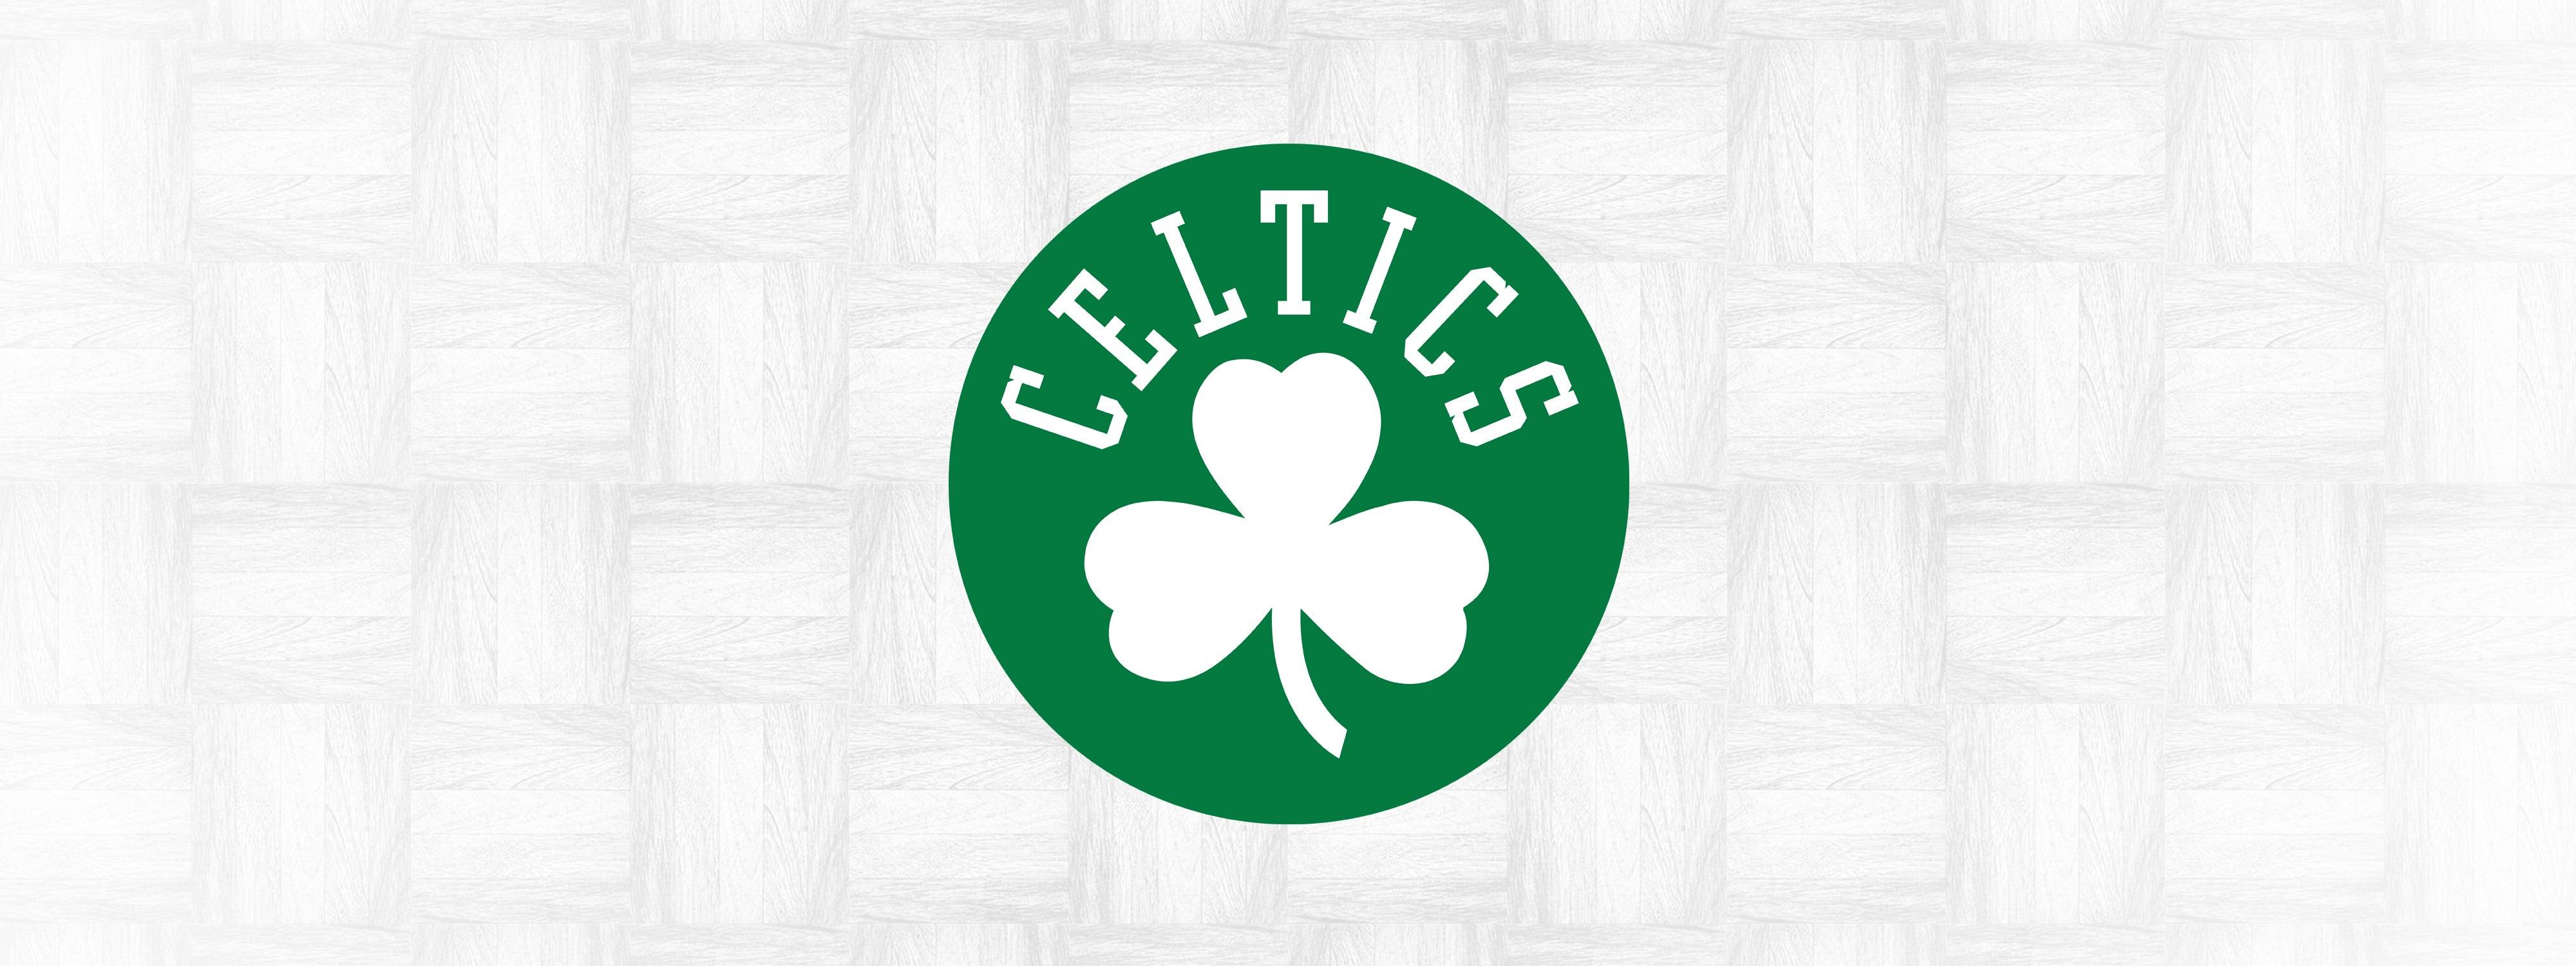 Celtics vs. Thunder